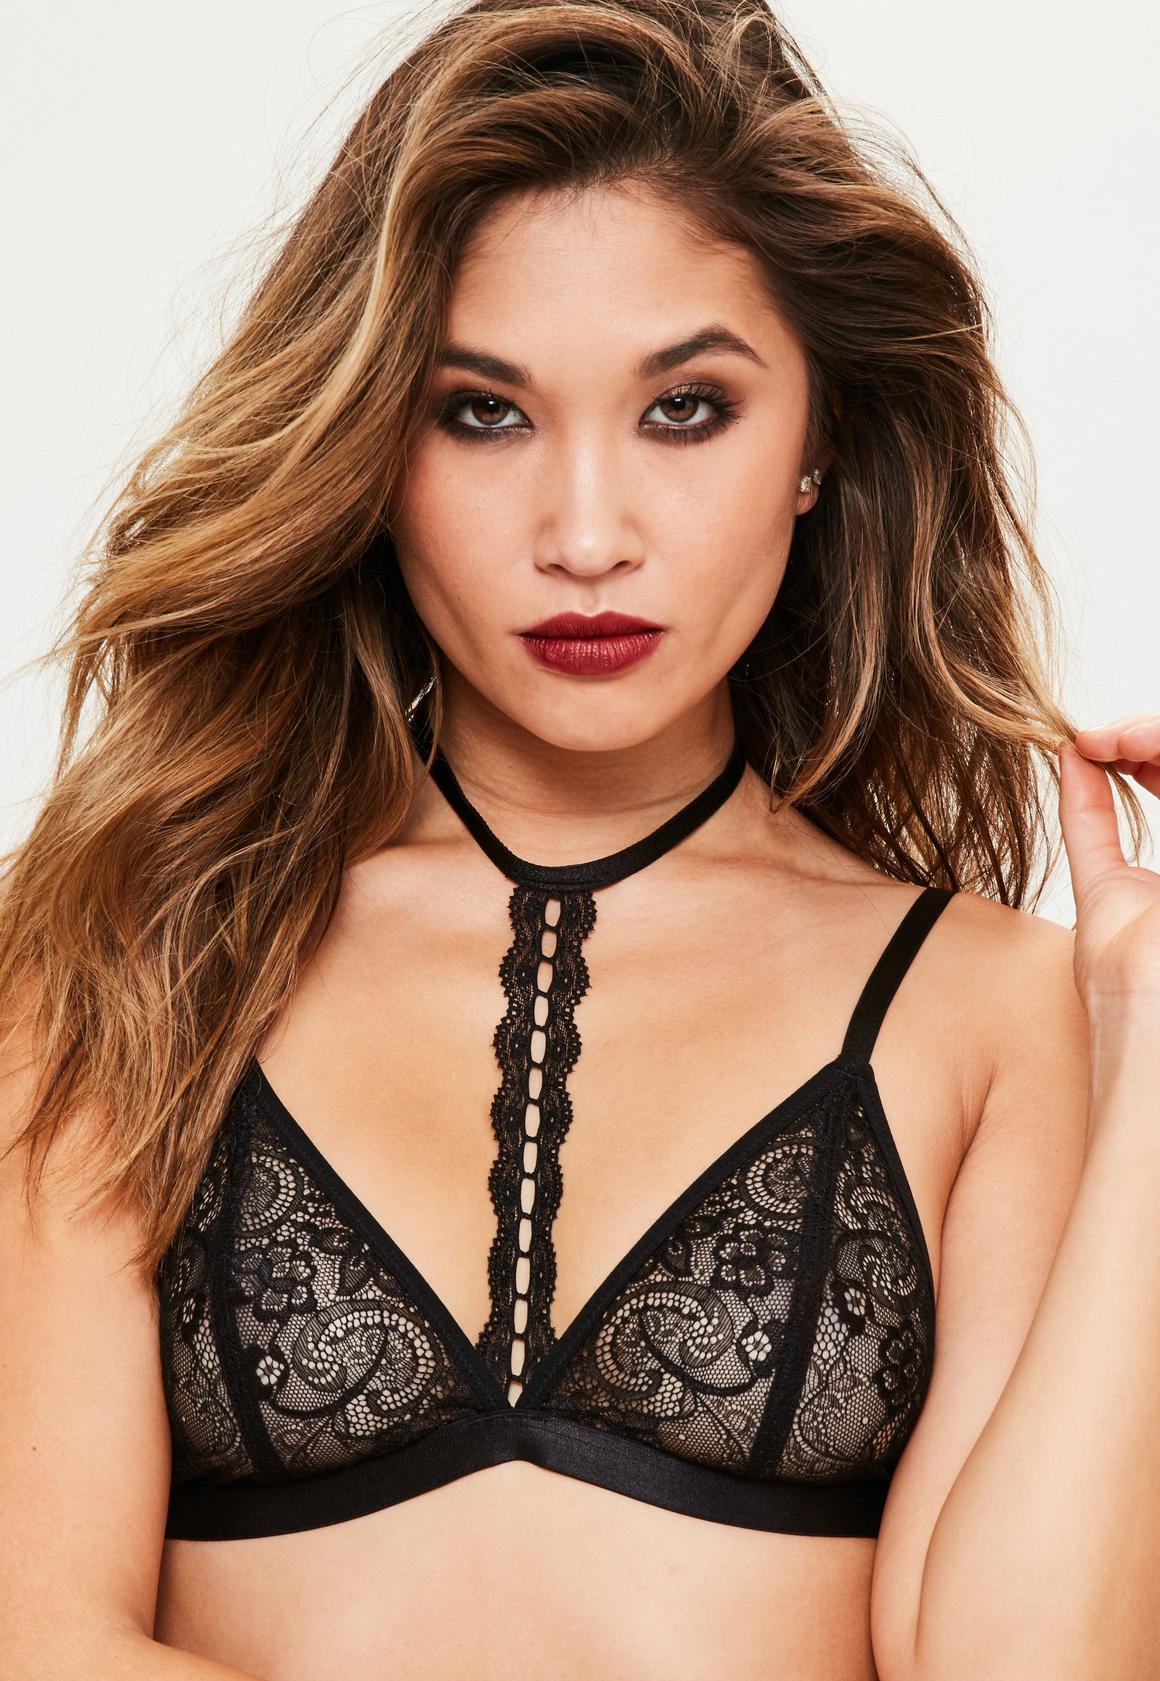 Lingerie | Womens Underwear & Silk Lingerie Sets - Missguided